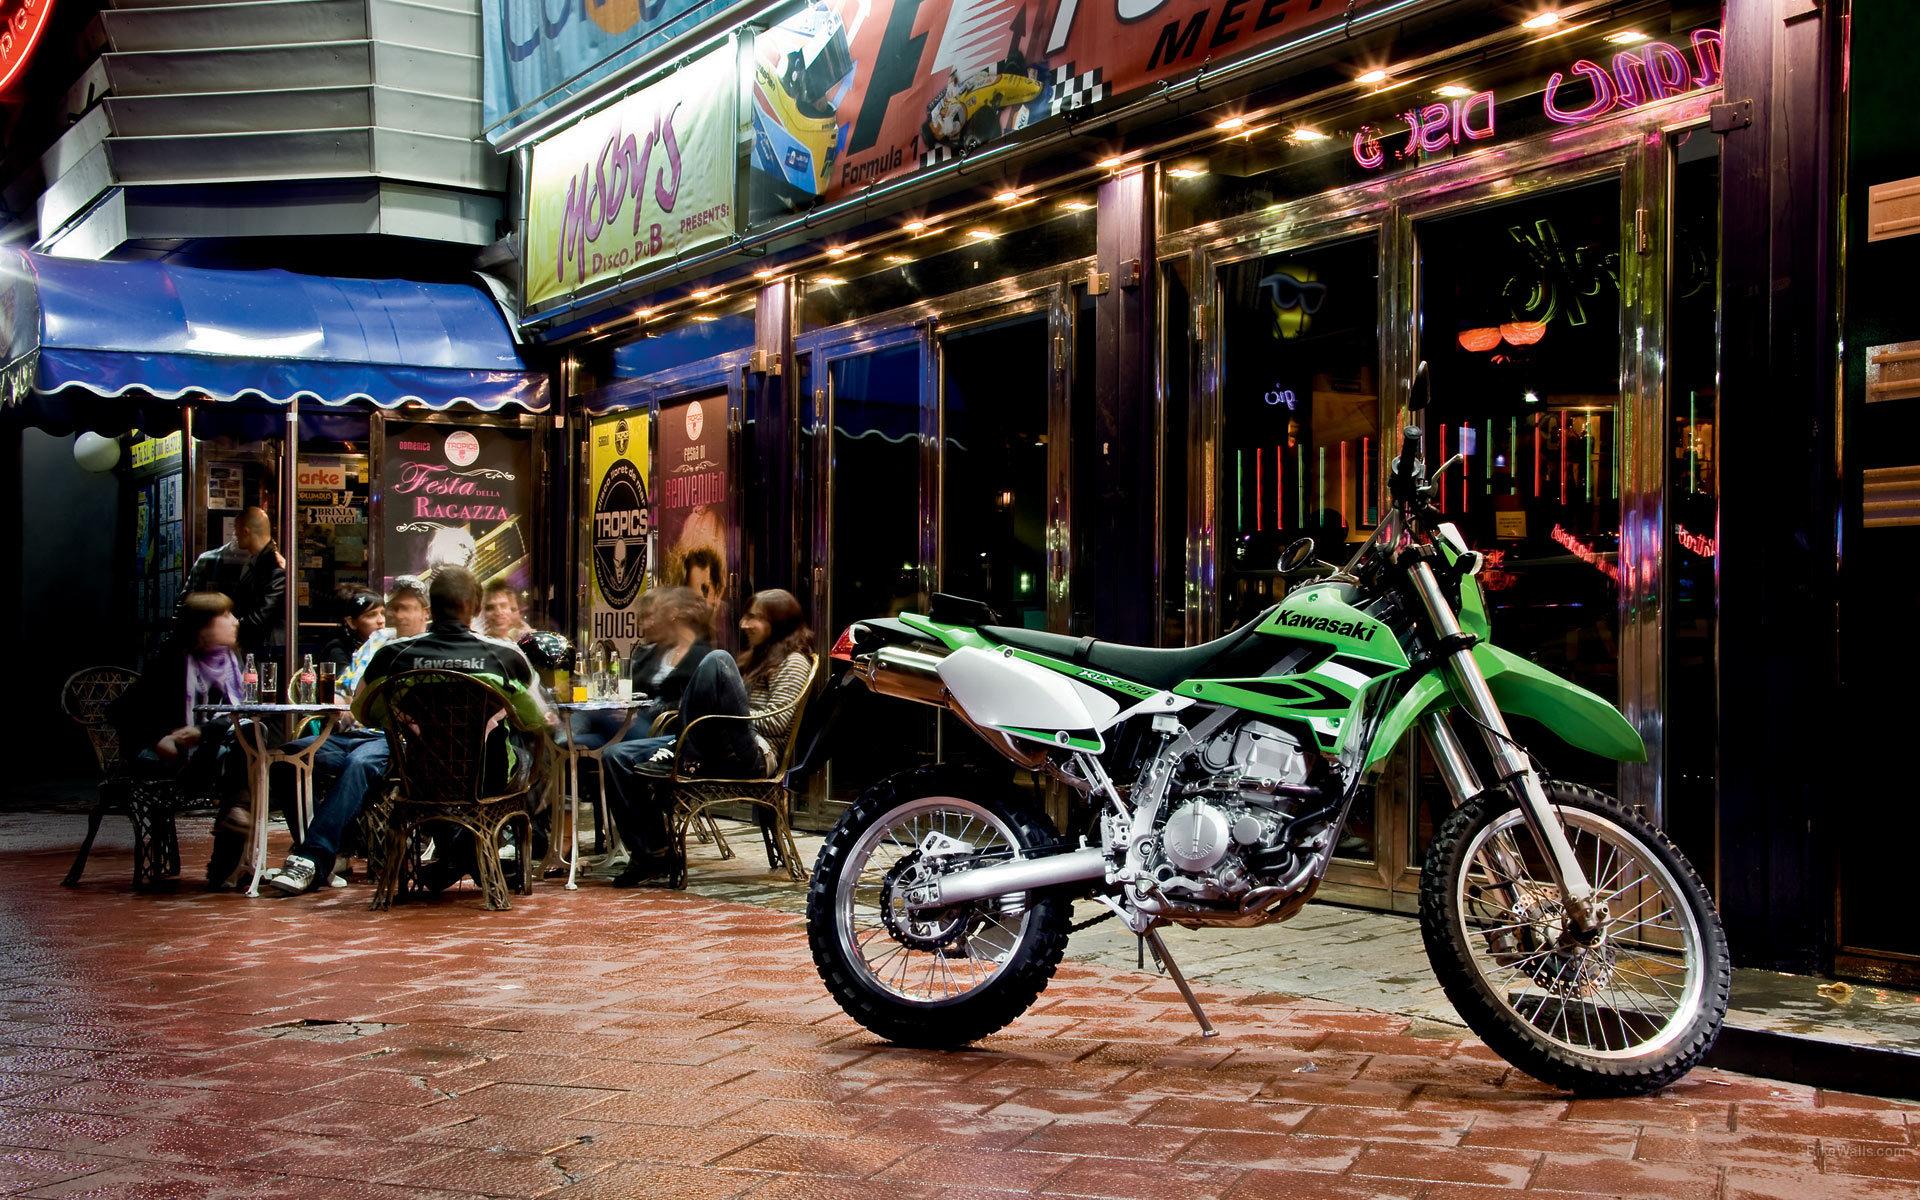 New Reliable Motorcycle Kawasaki KLX 250 Wallpapers And